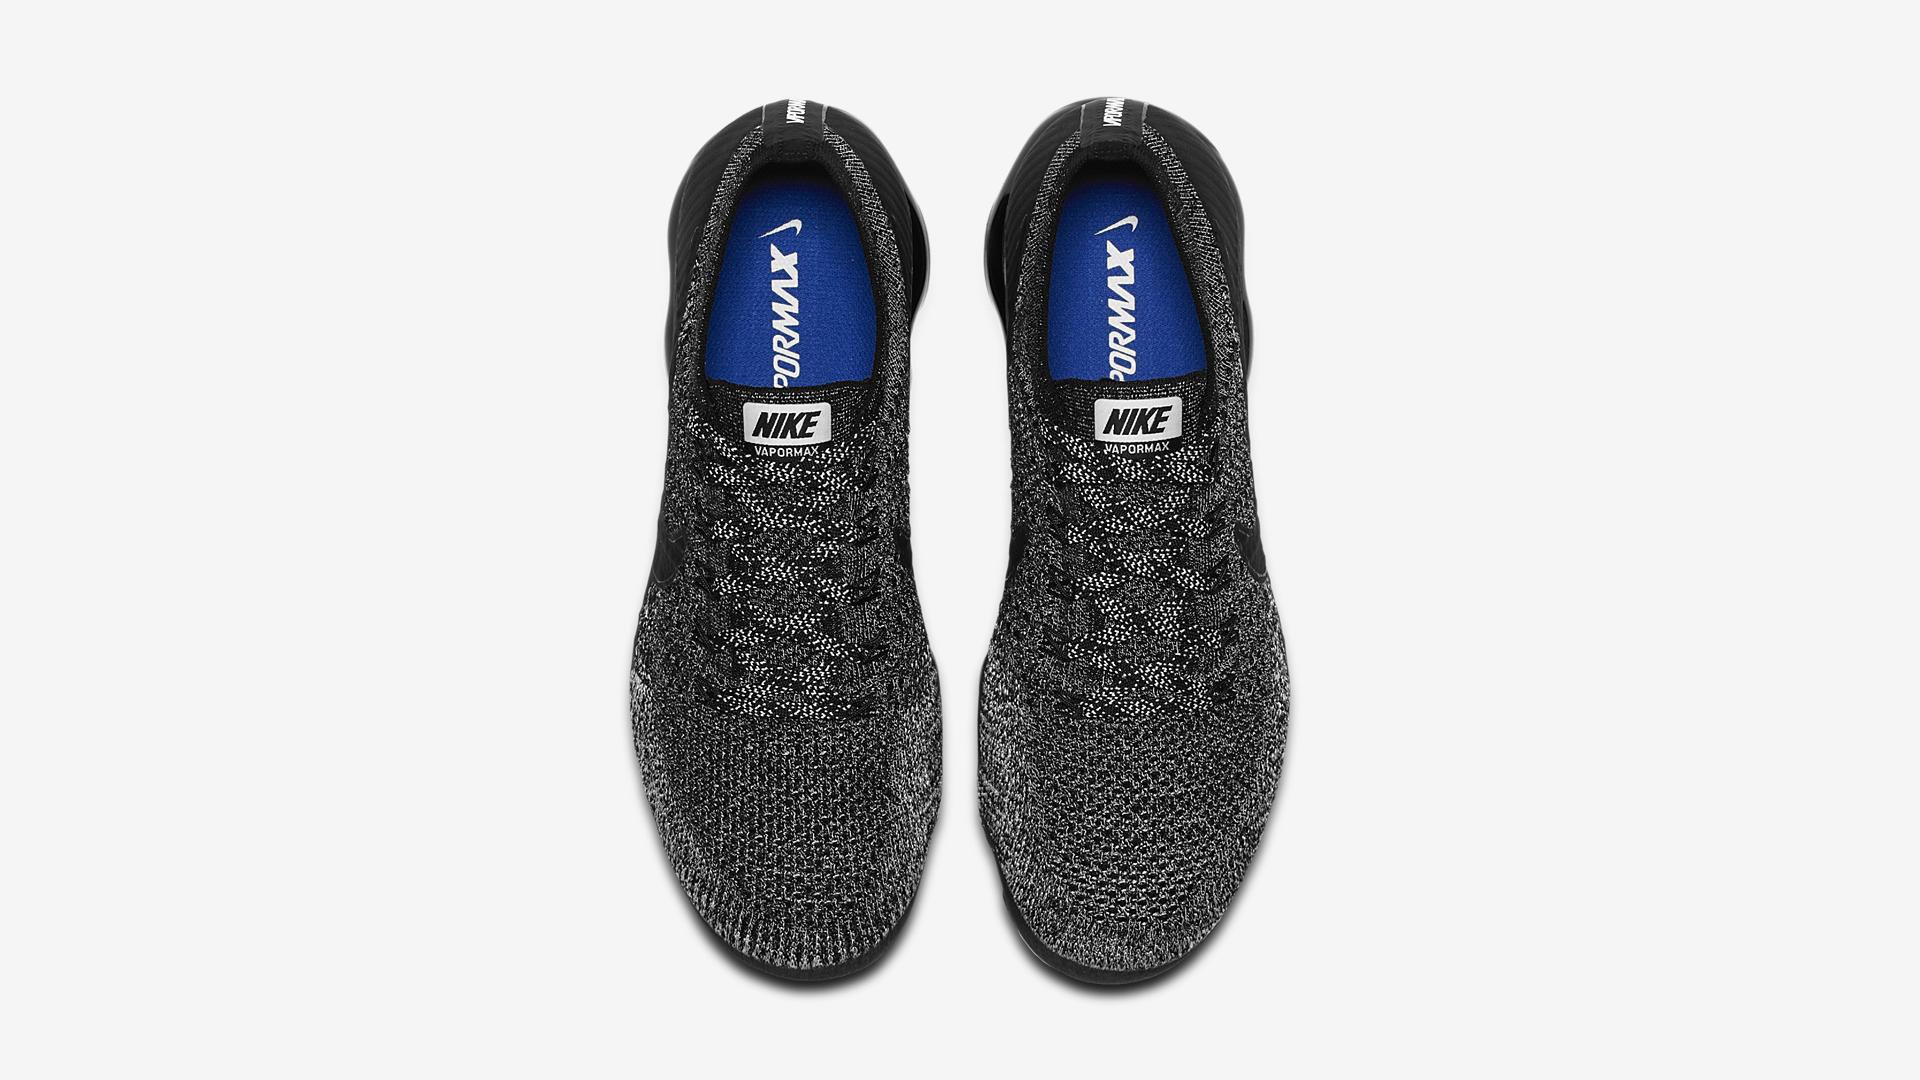 849558 041 Nike Air VaporMax Oreo 3